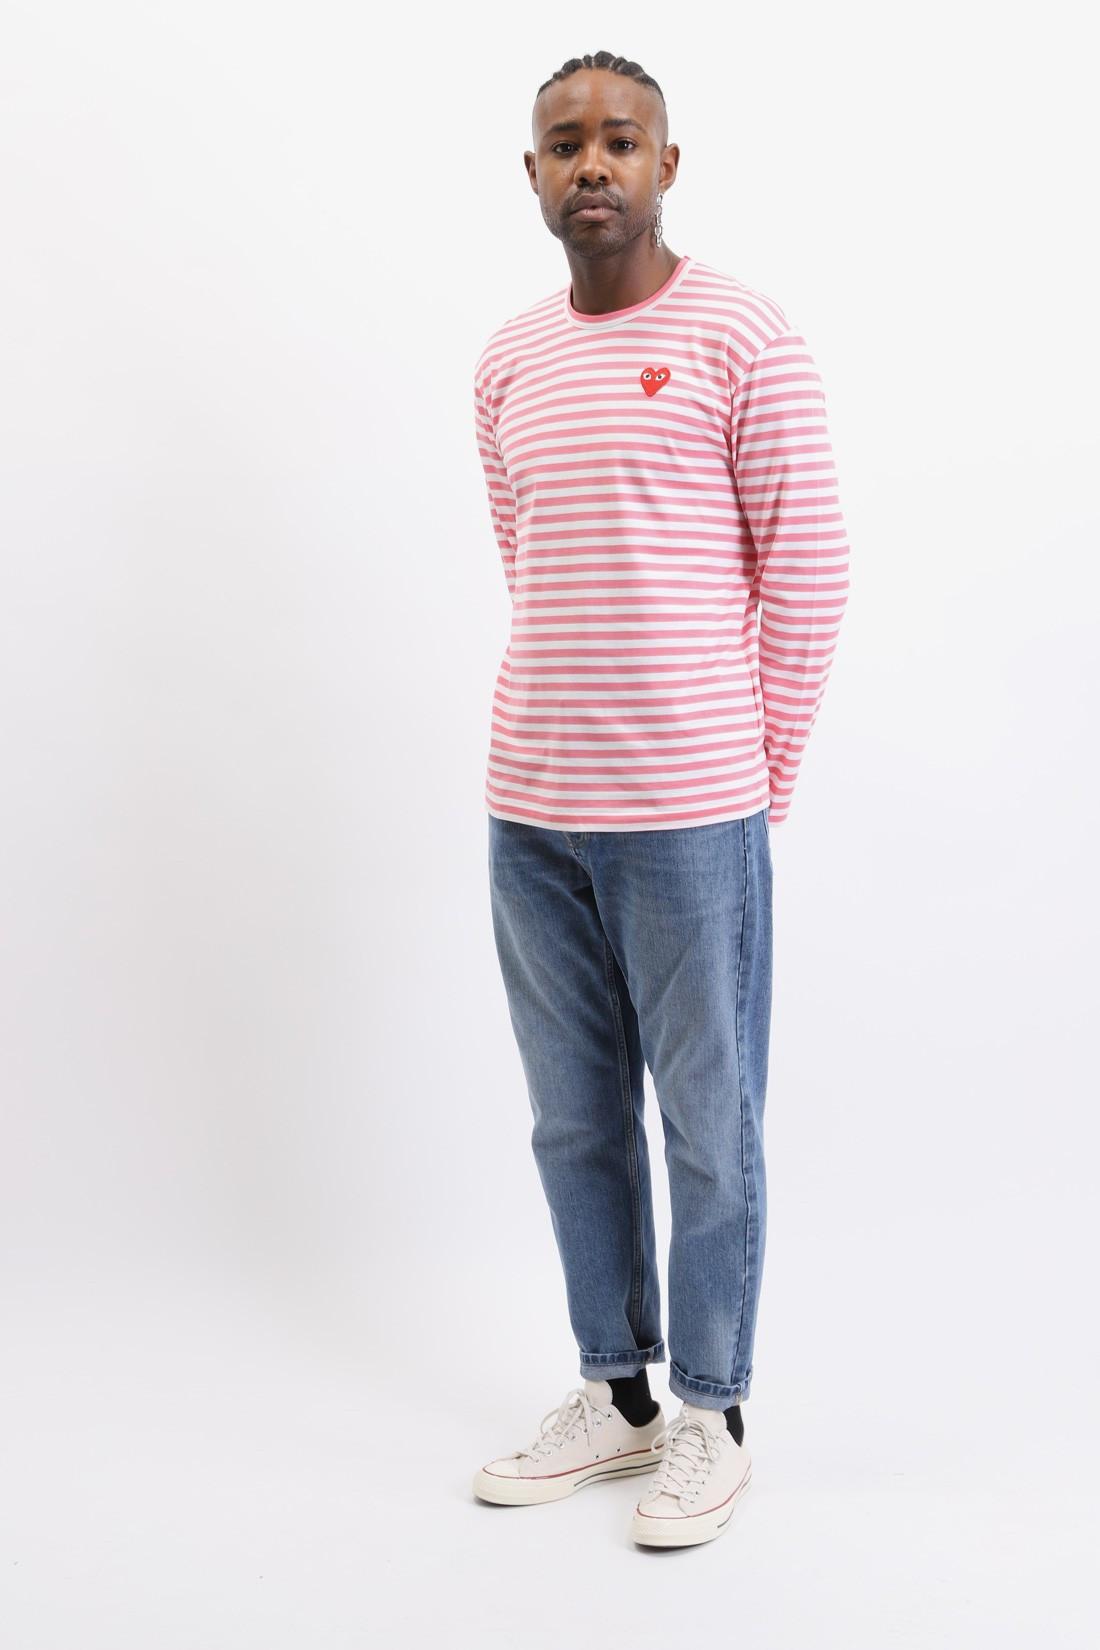 COMME DES GARÇONS PLAY / Play striped t-shirt Pink white